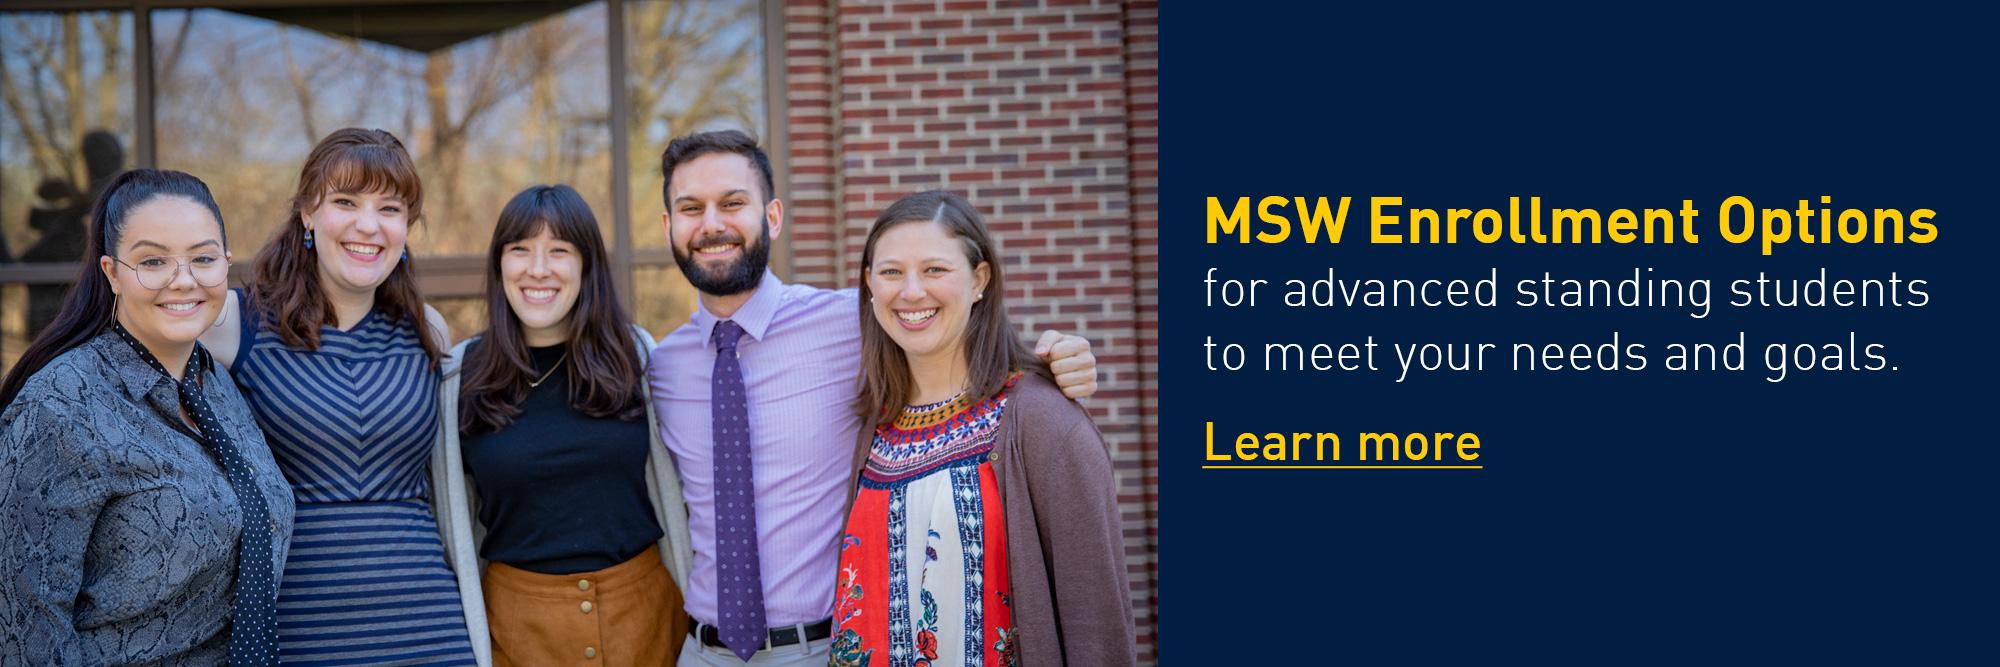 MSW Enrollment Options